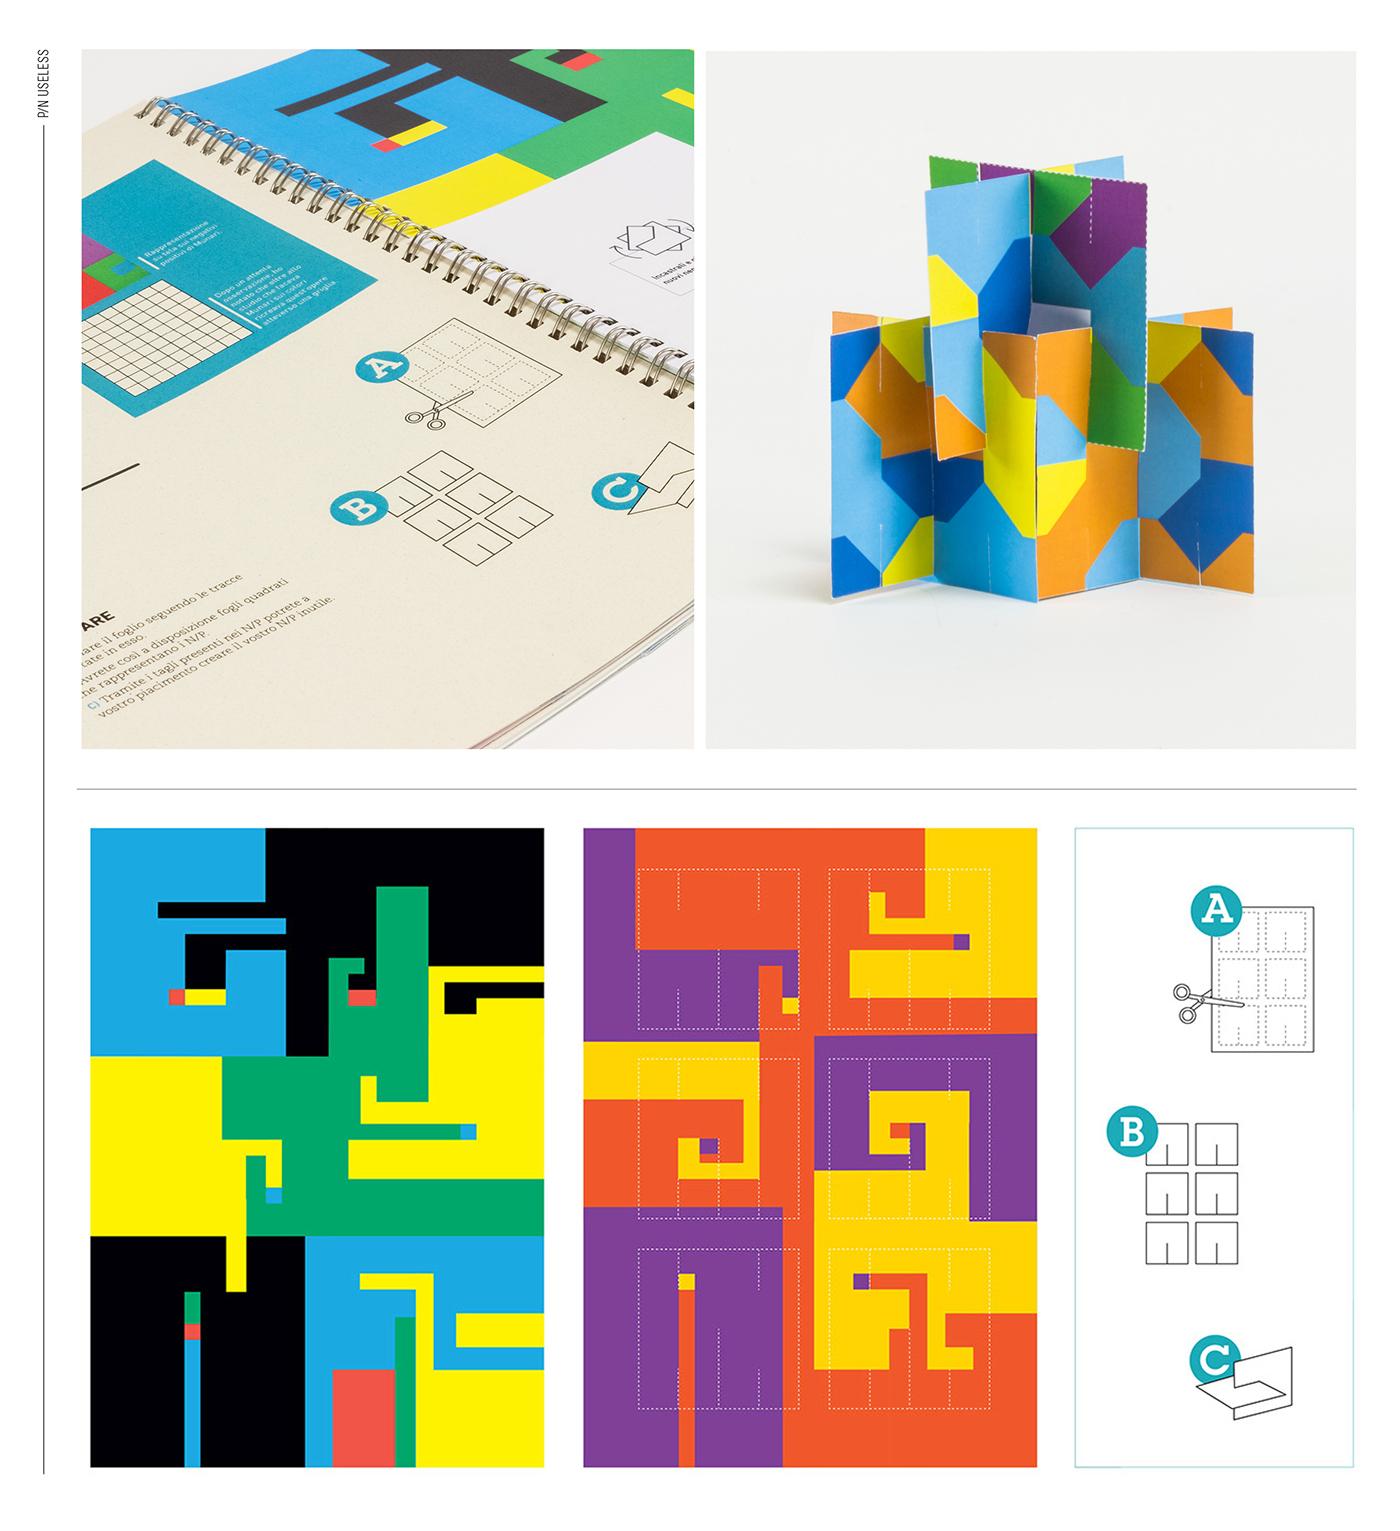 Experimentation folder cartons paper craft #inspire creative inspire